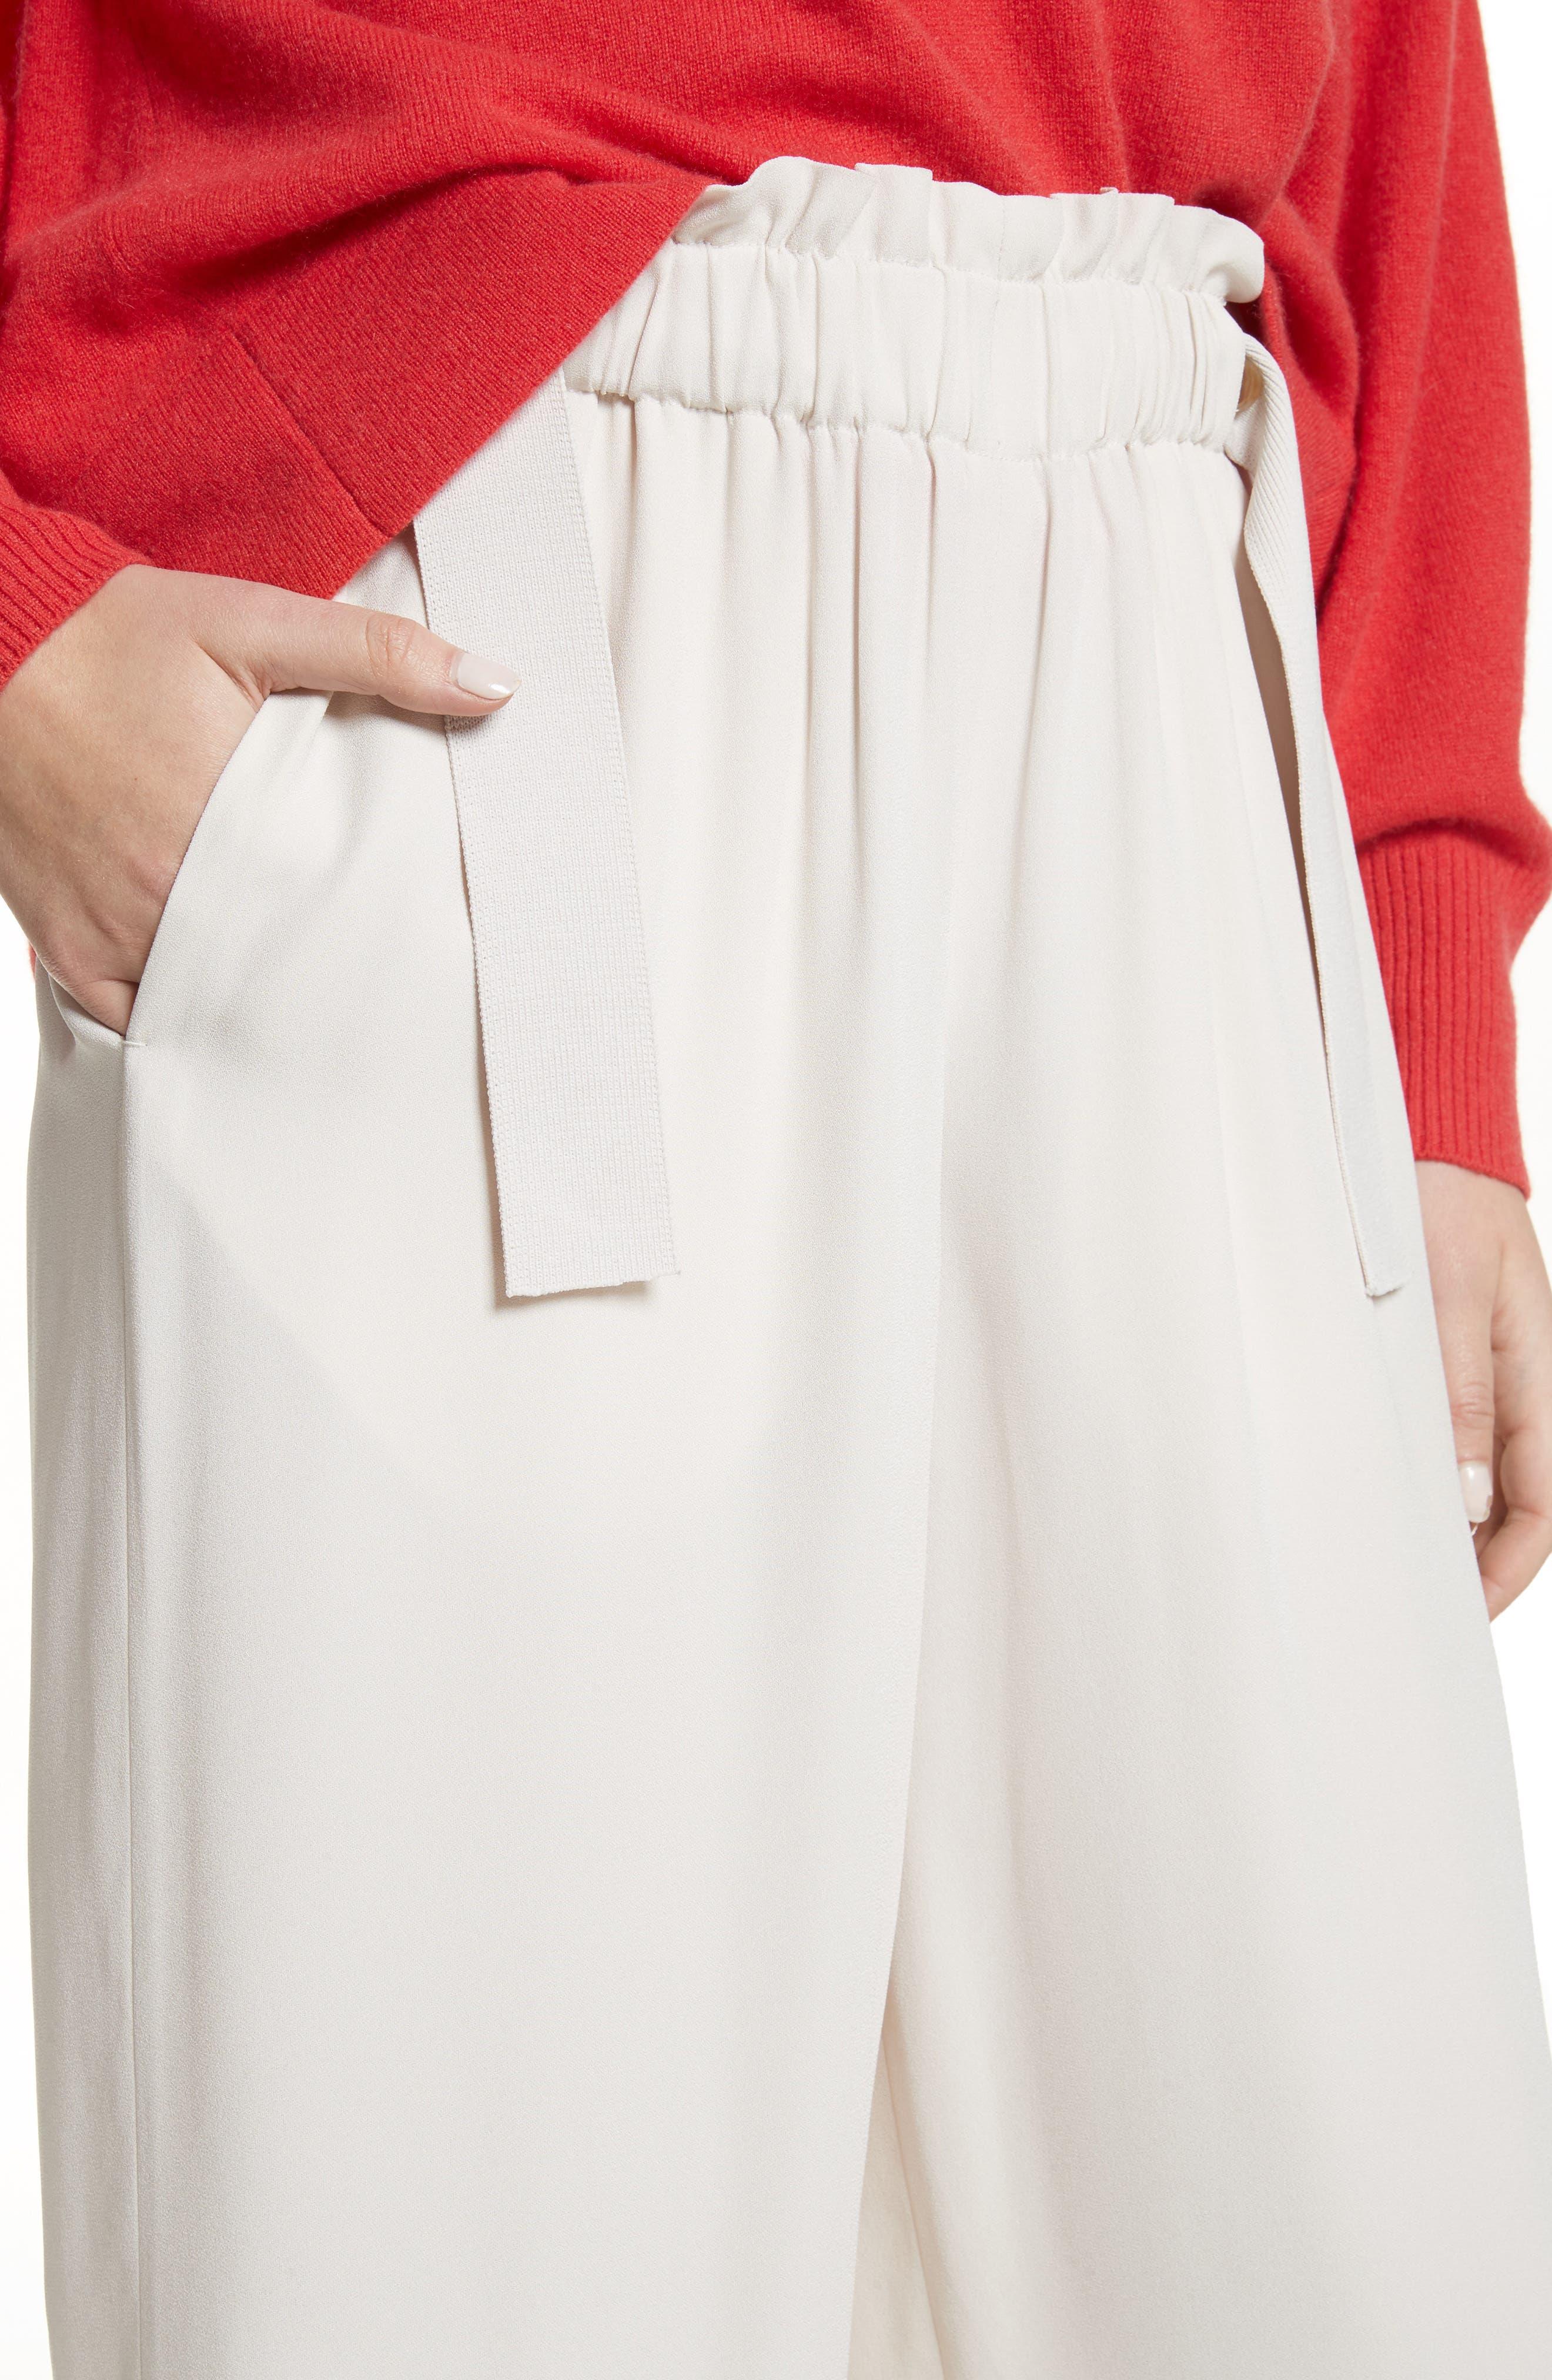 Cinched Waist Culottes,                             Alternate thumbnail 6, color,                             Sandstone